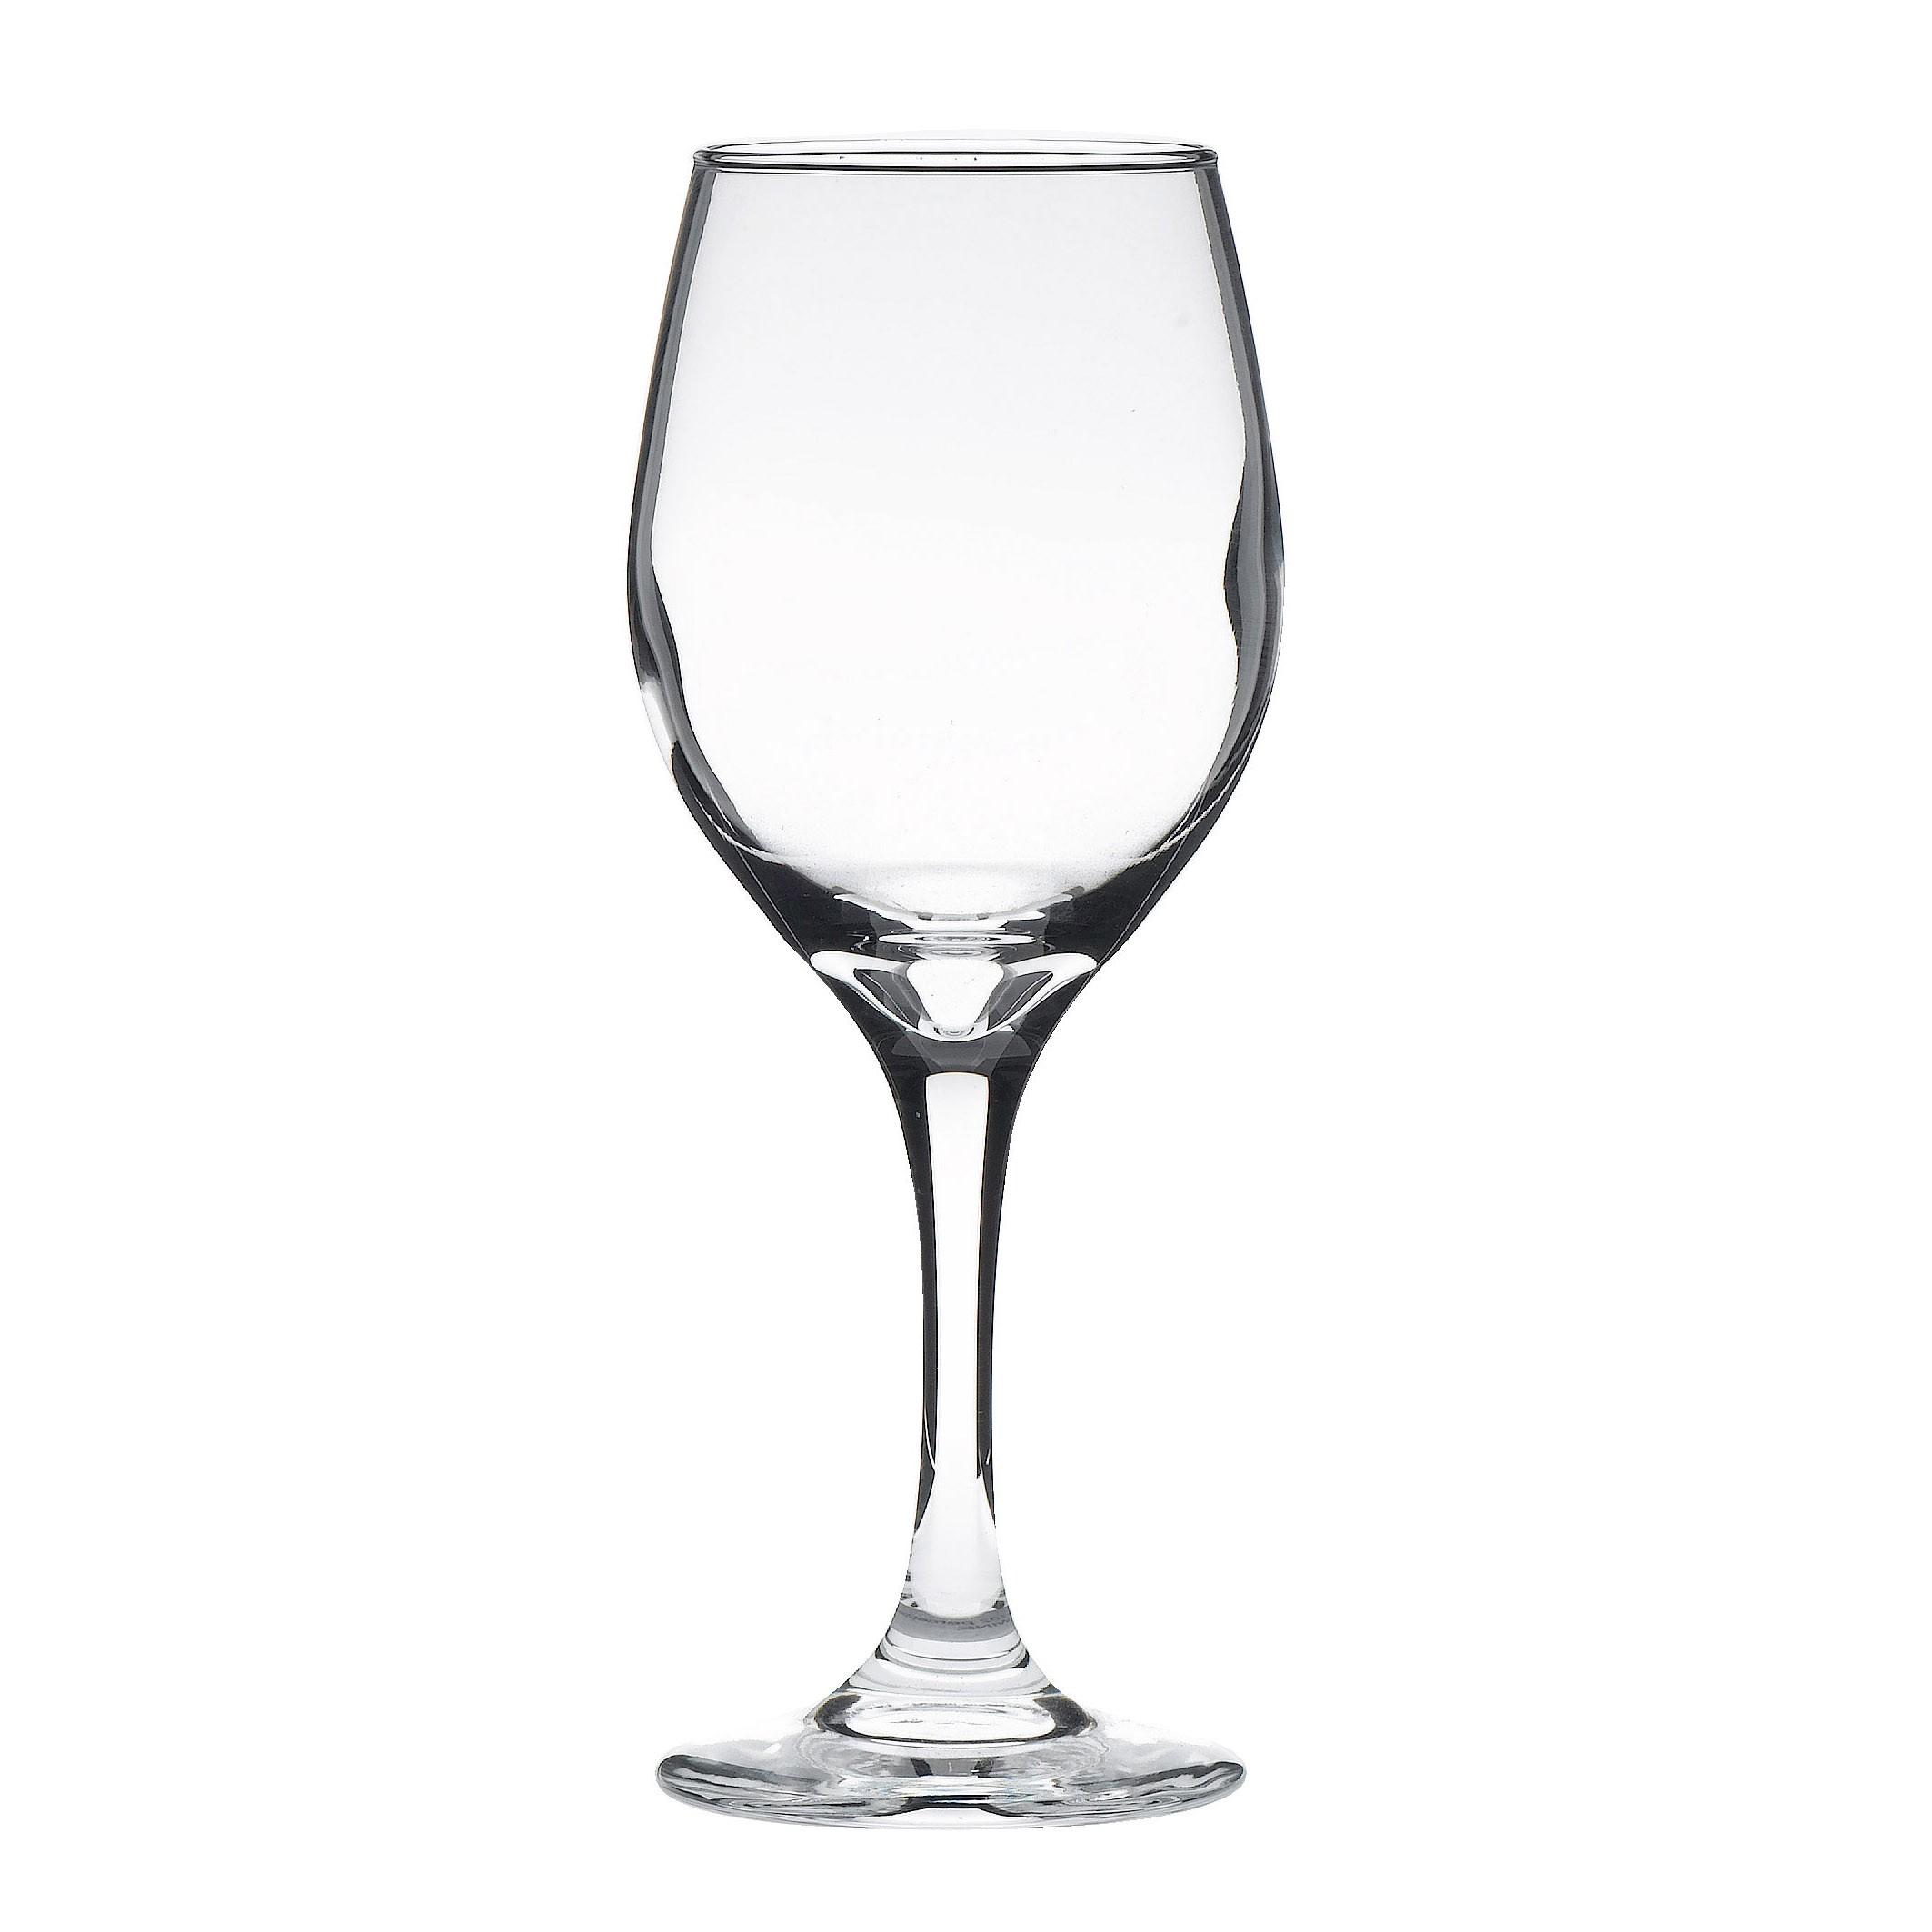 Perception Wine Glass 31cl 11oz